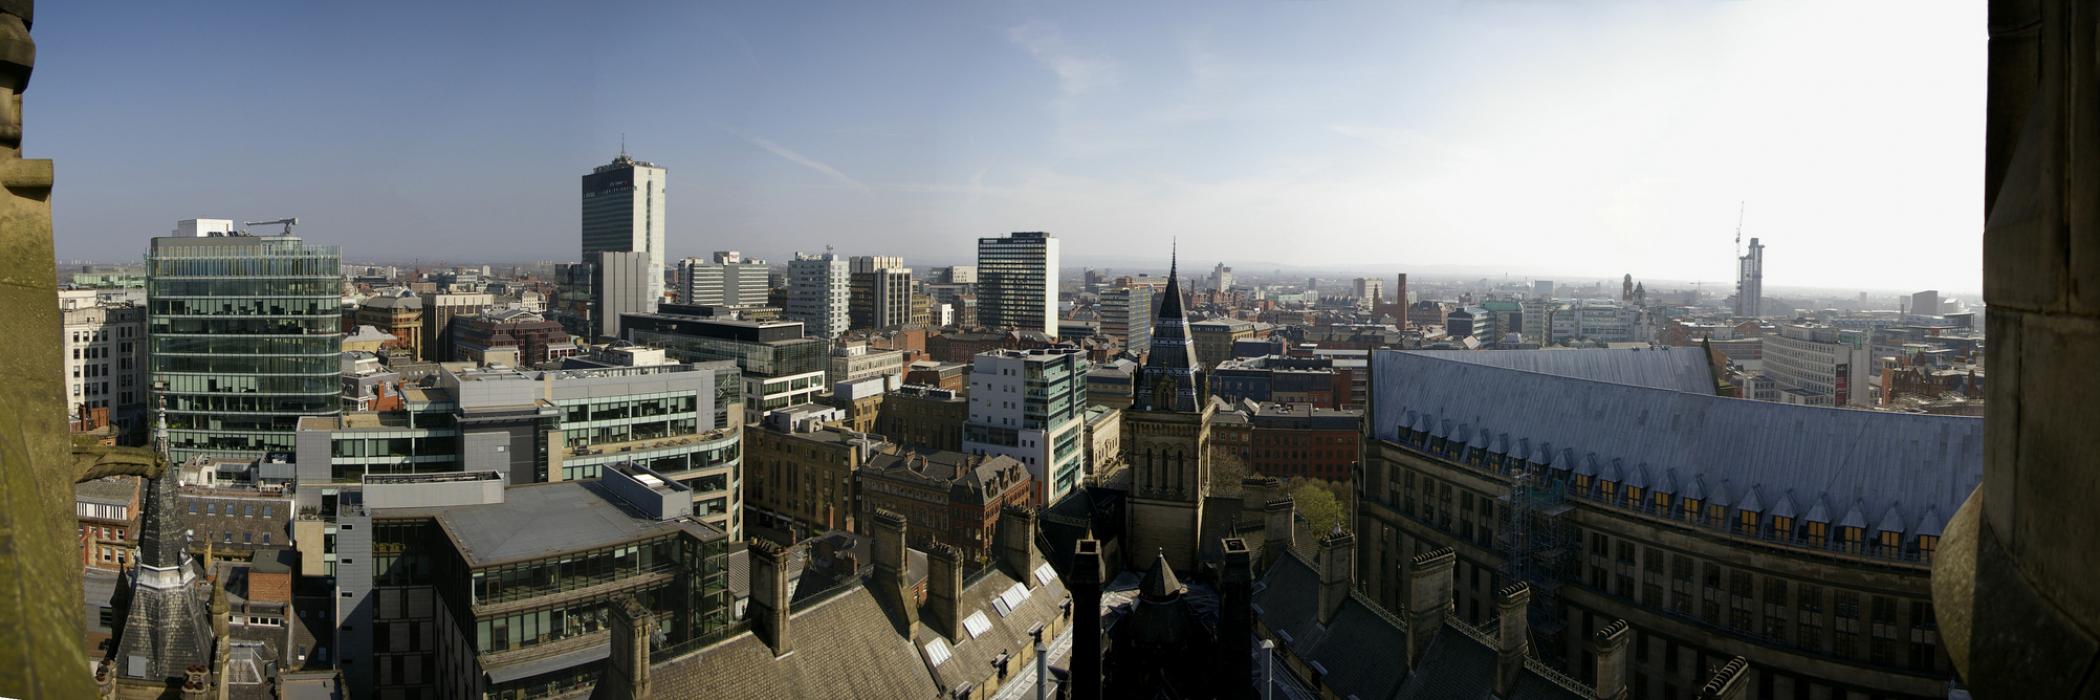 Manchester Skyline photo